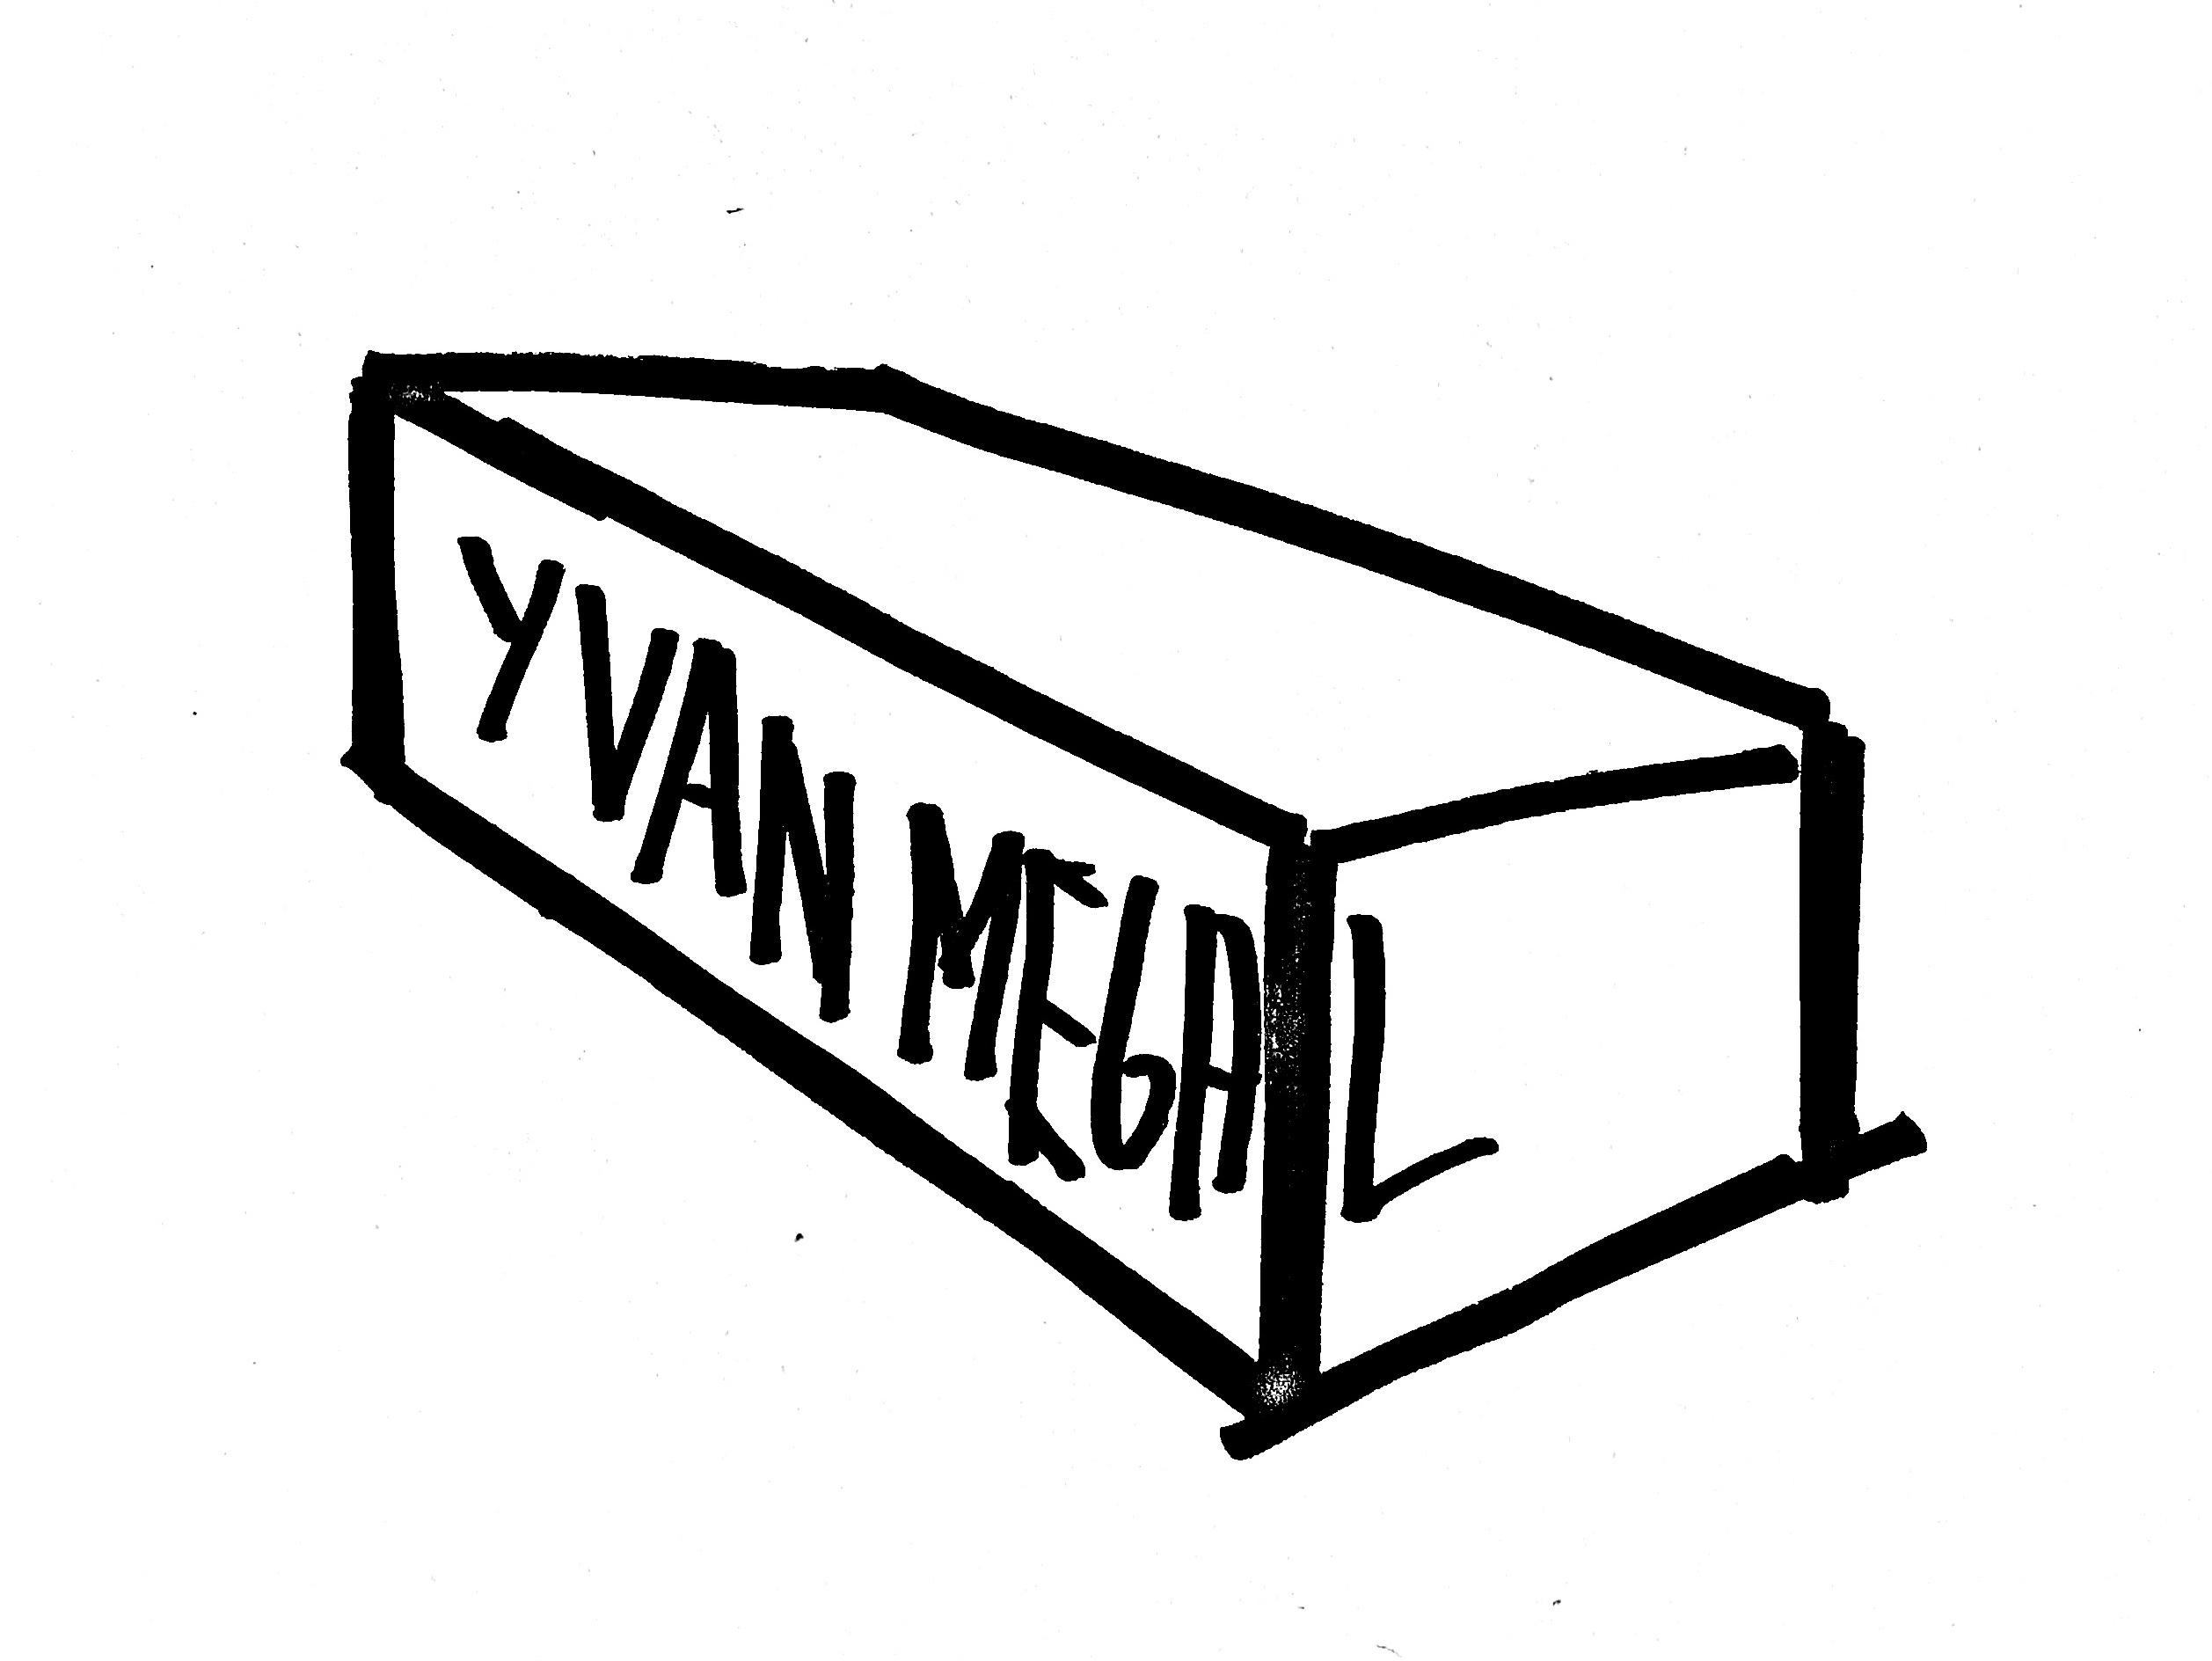 YVAN MEGAL